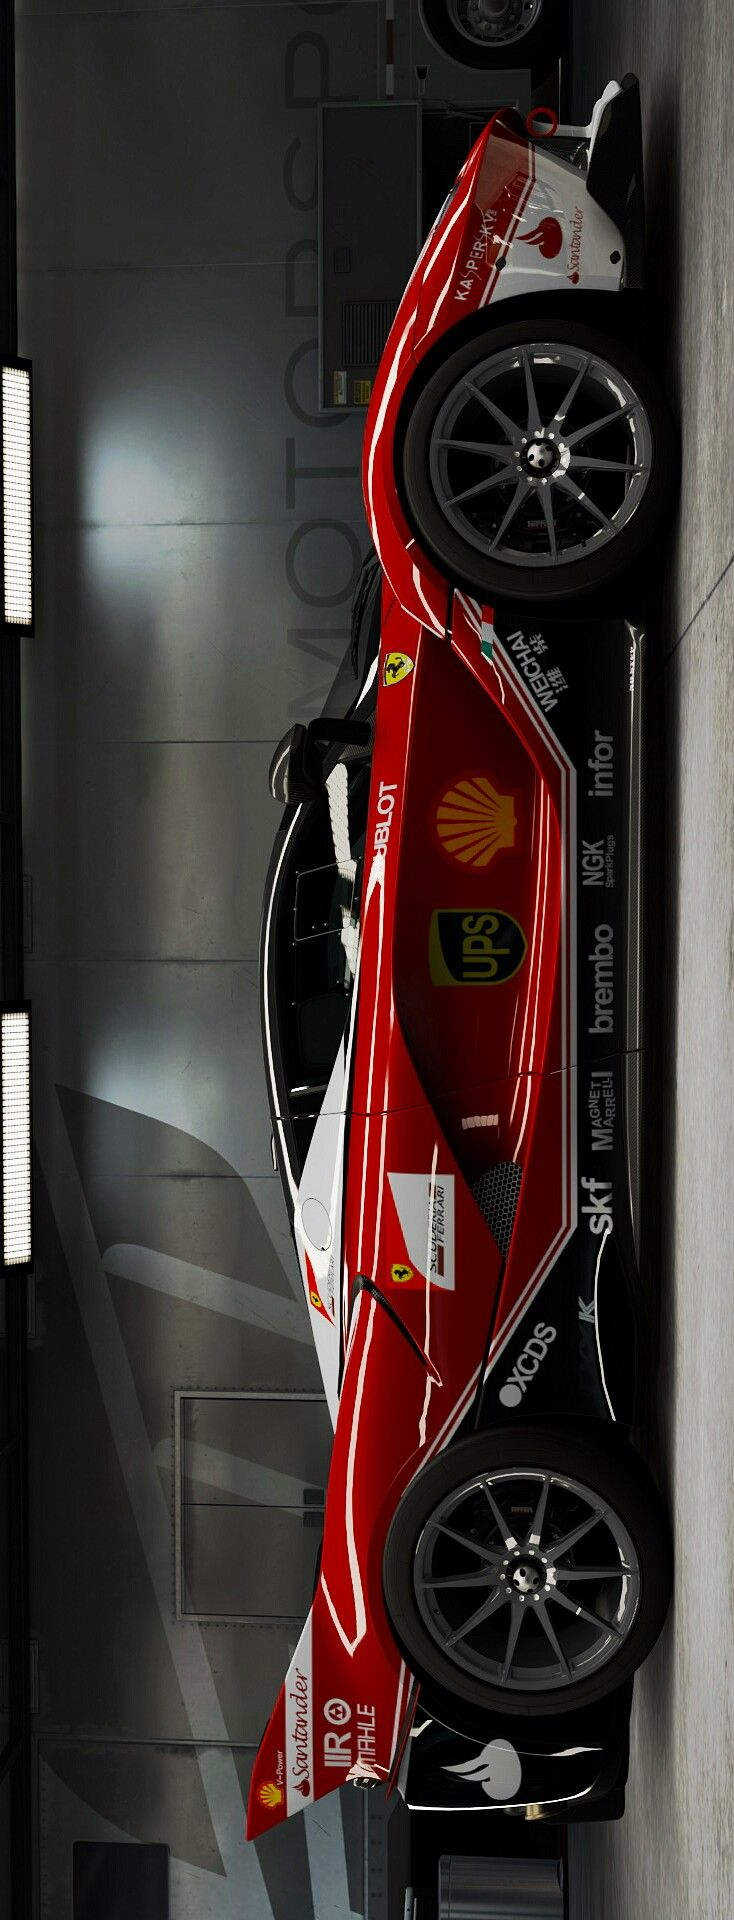 (°!°) Ferrari FXX-K using F1 Livery, HELL-yeah....